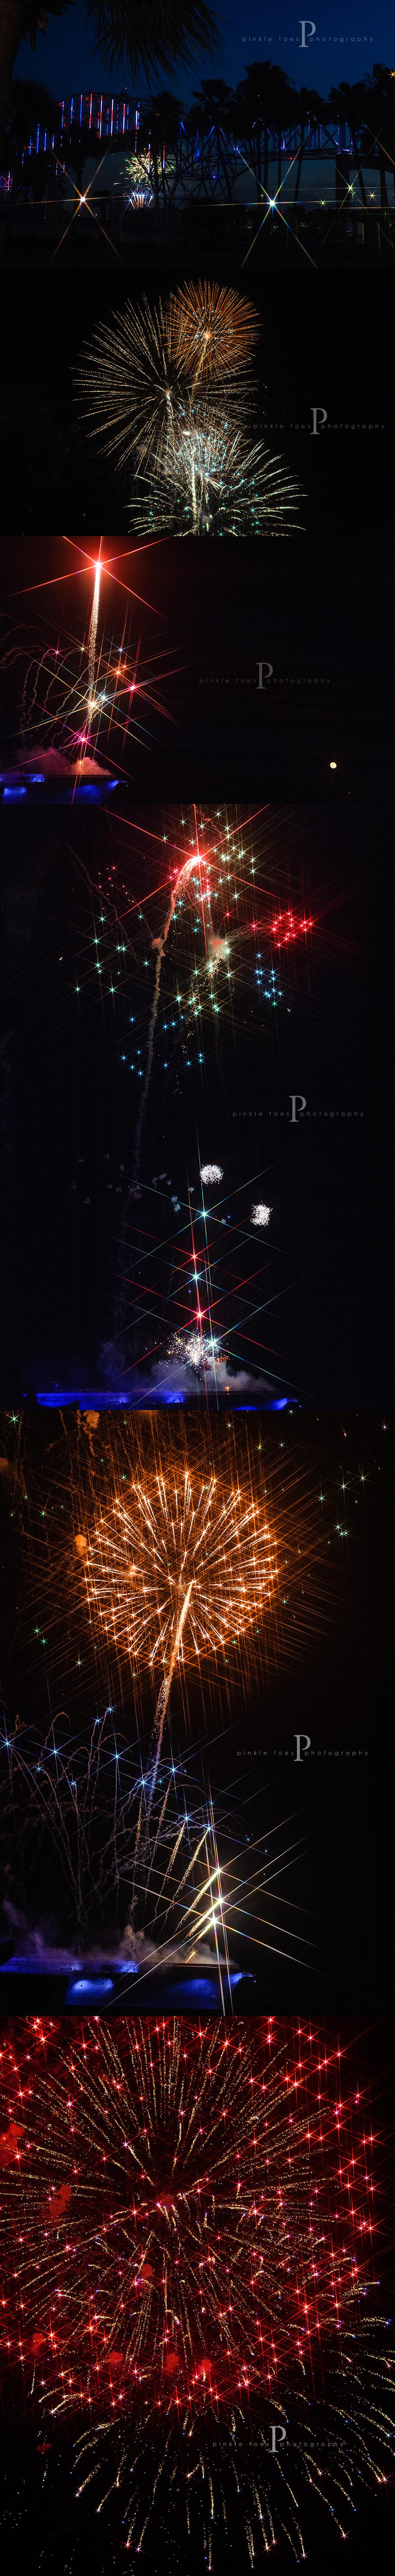 fireworks-austin-corpus-christi-commercial-photography.jpg